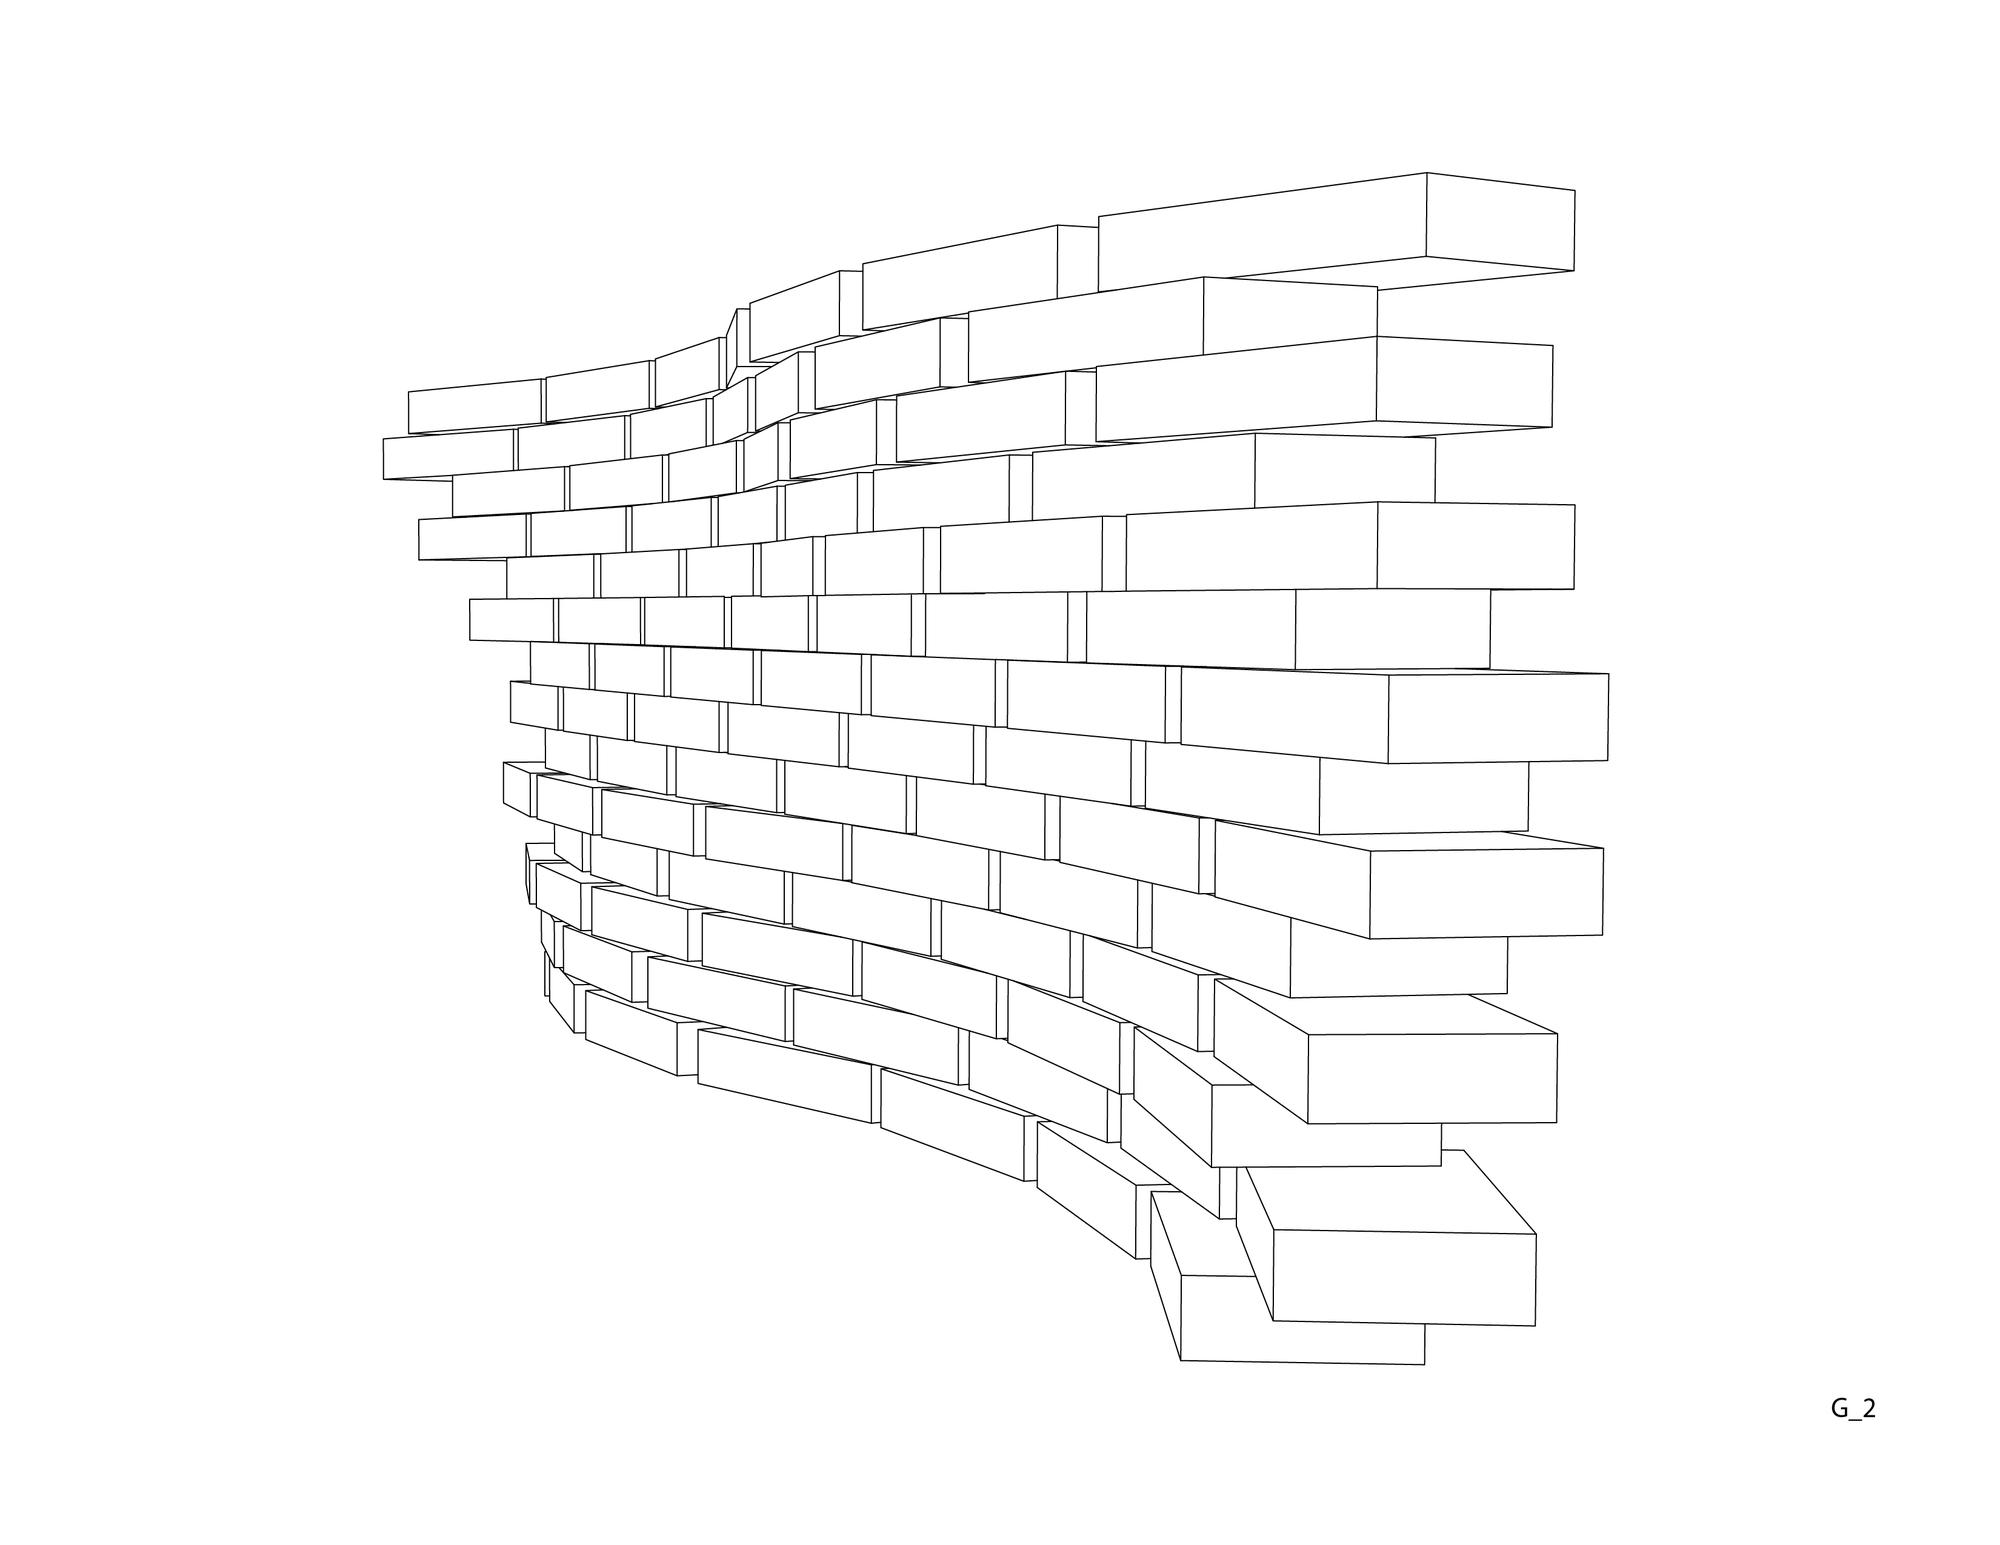 Isométrica: Grupo 2. Image Cortesia de Taller Materialidad 2014 UFSM